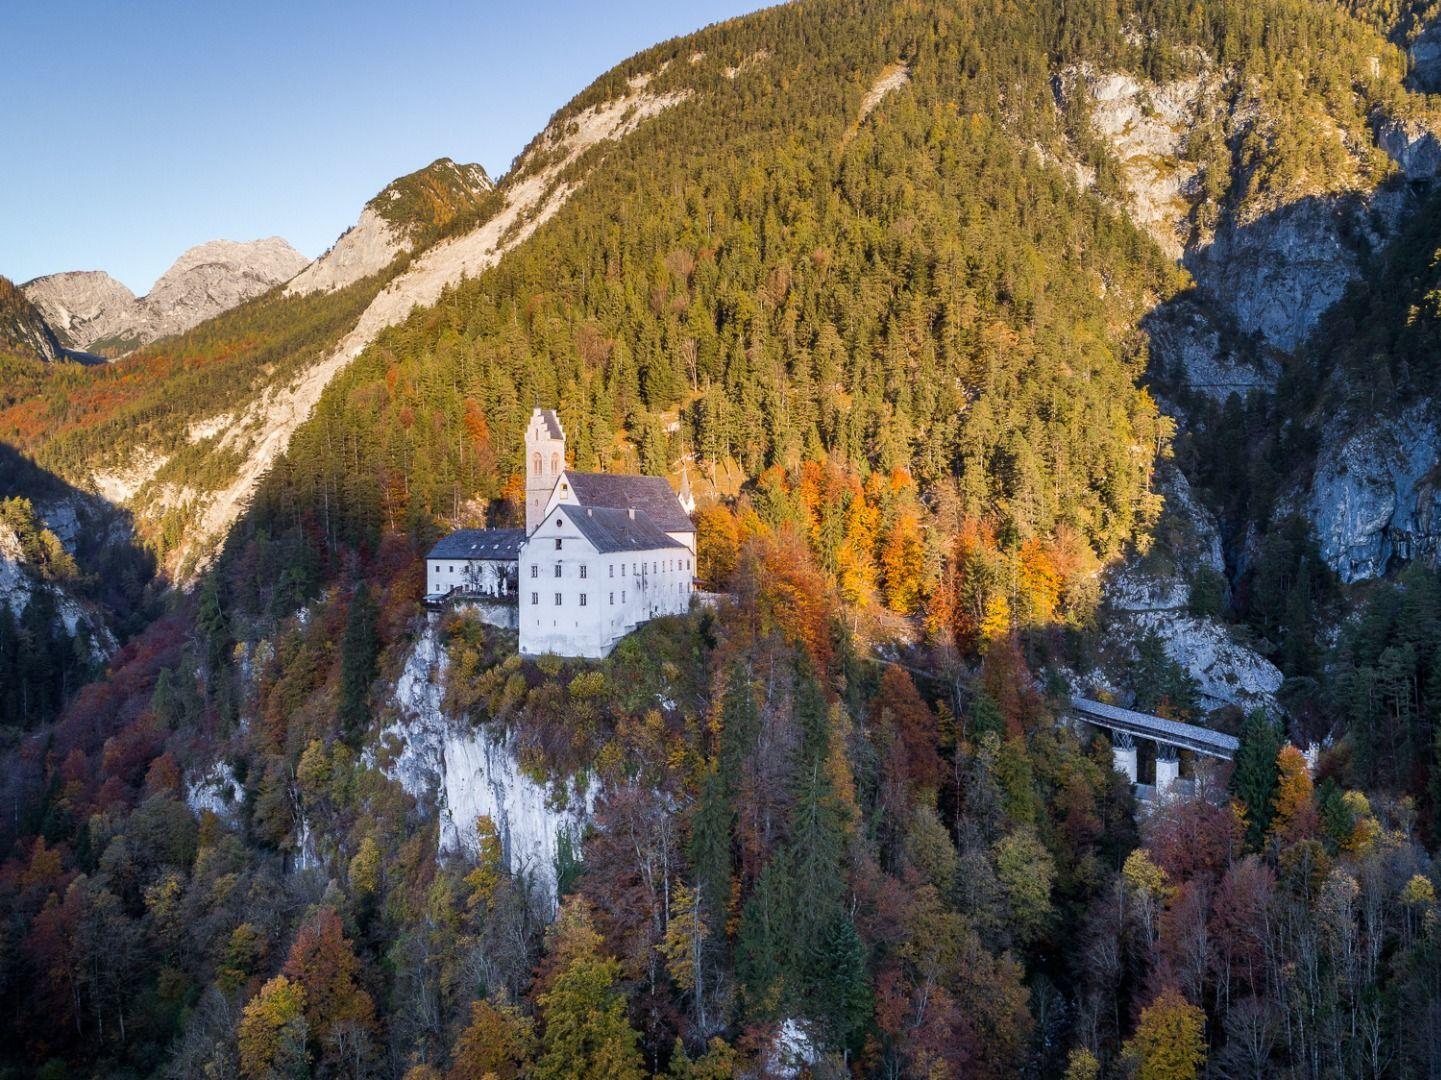 St. Georgenberg Monastery